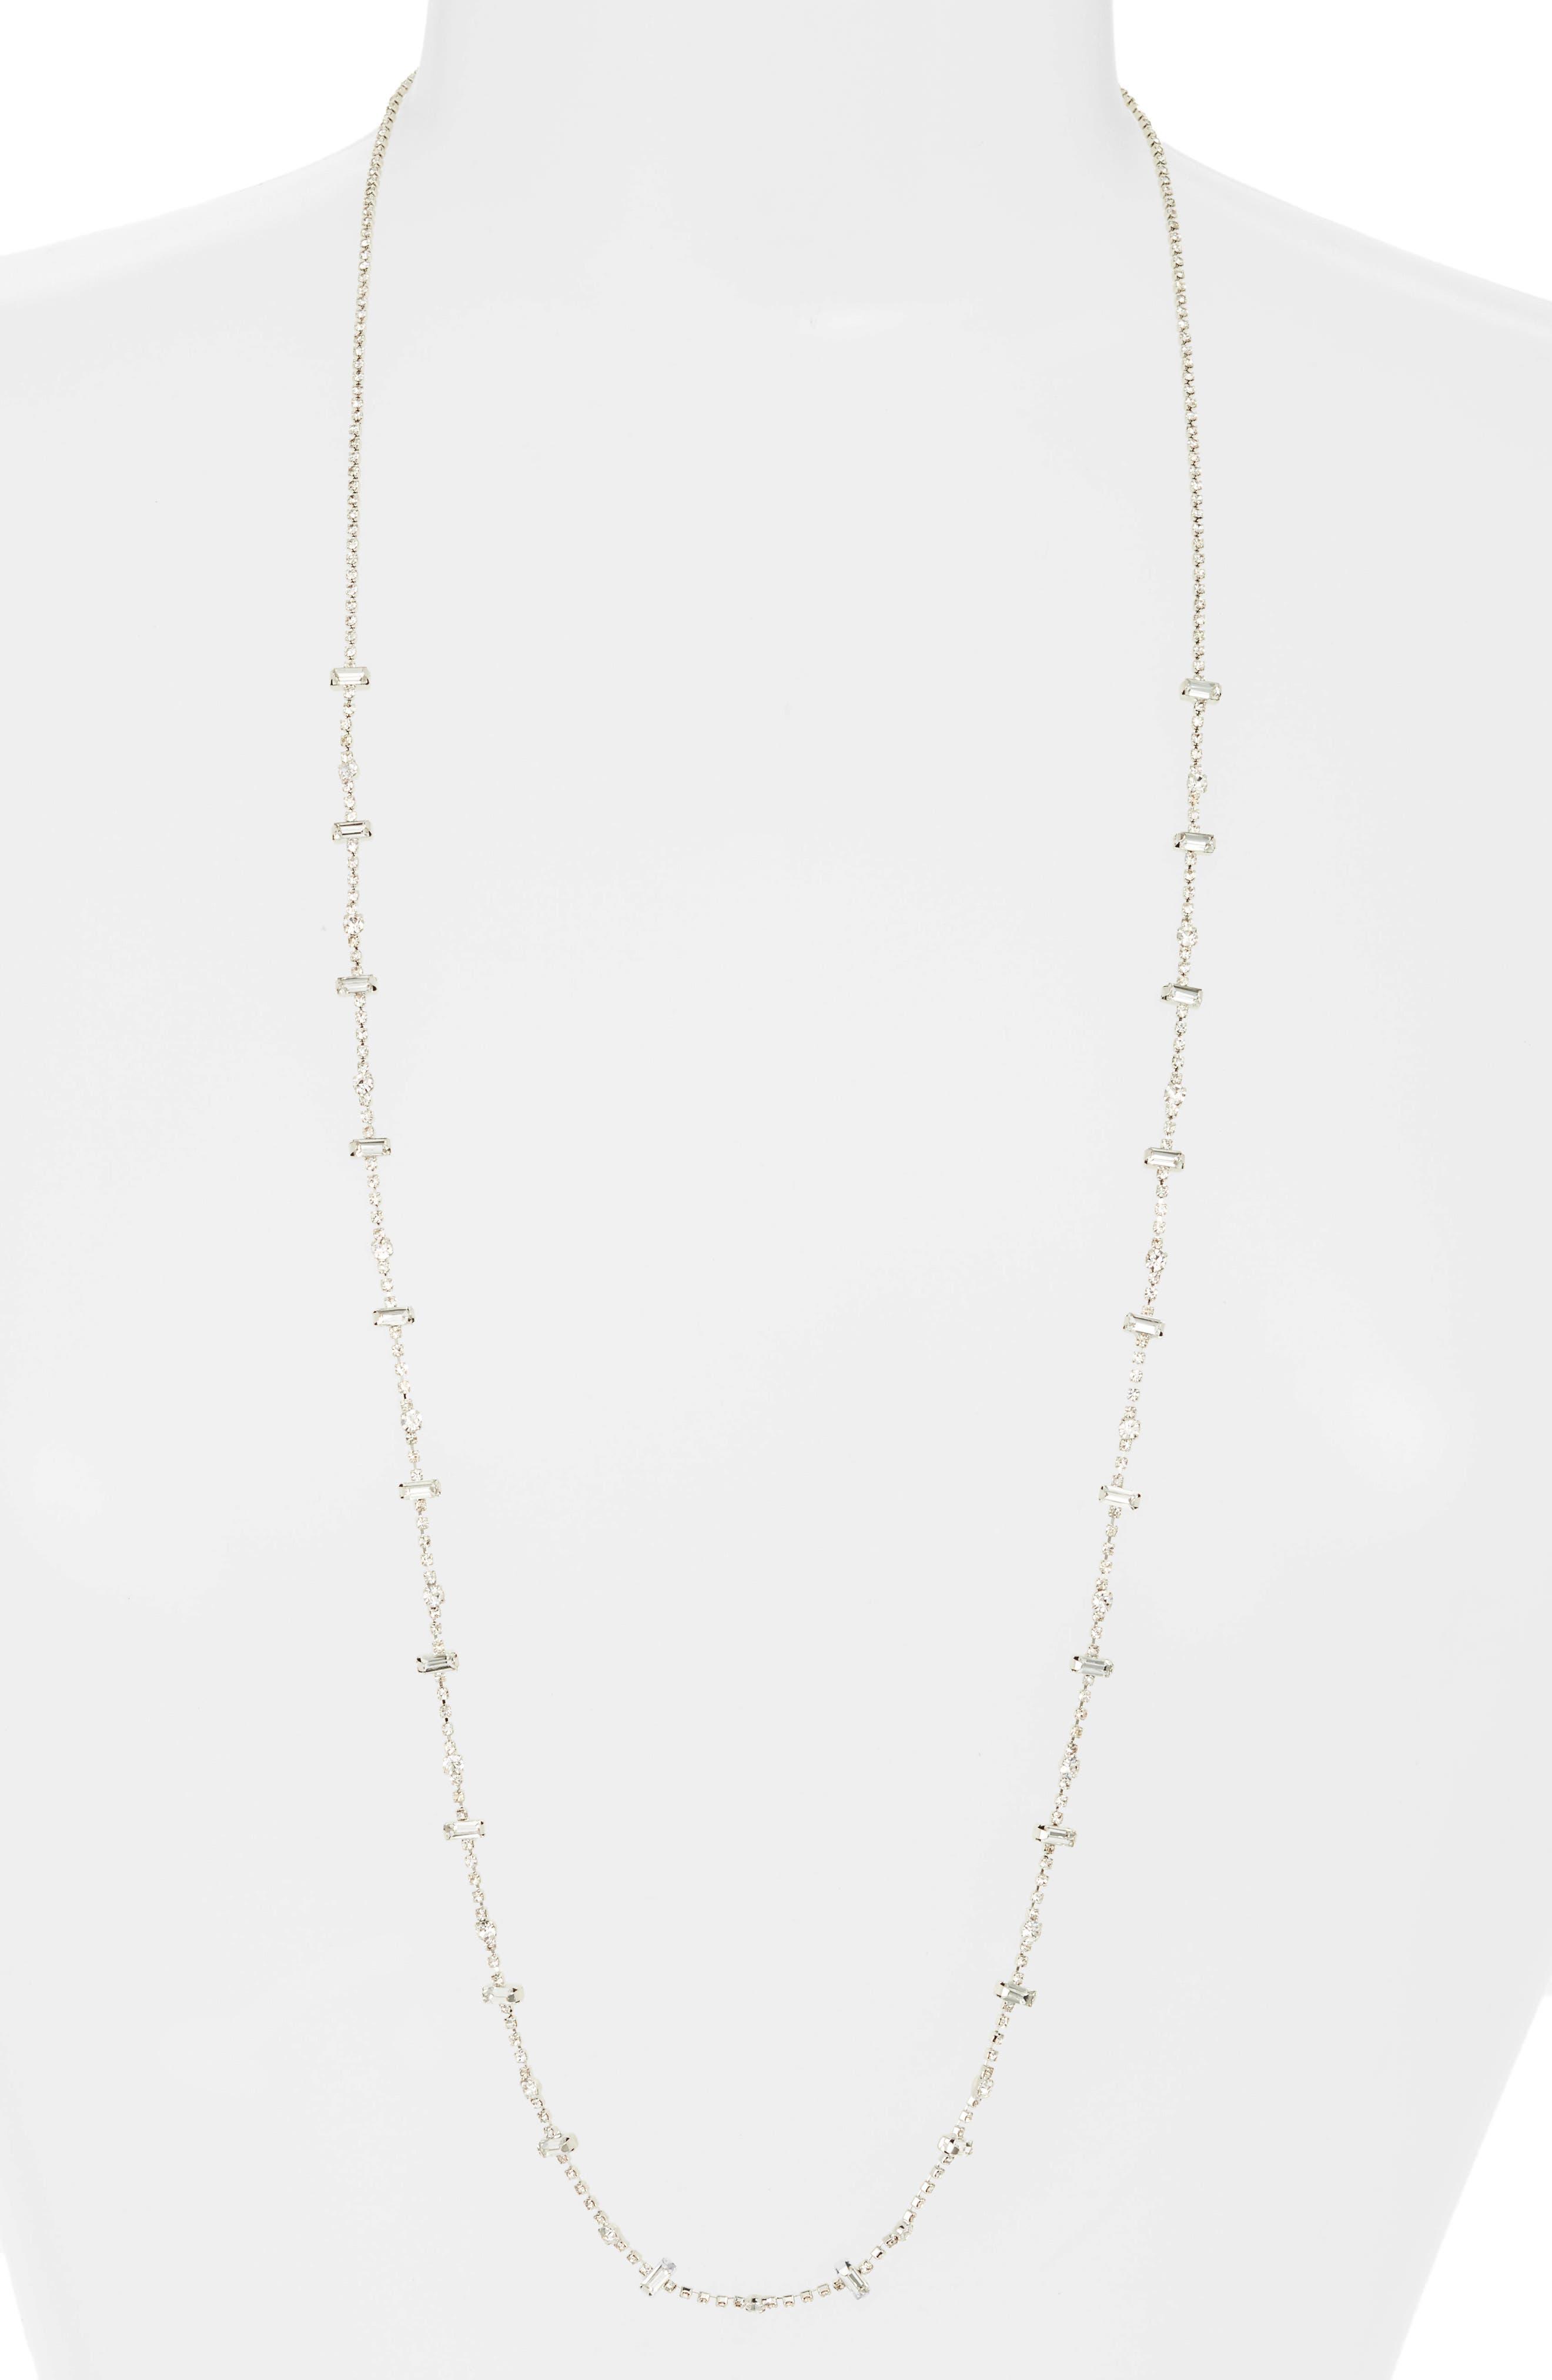 Crystal Baguette Long Necklace